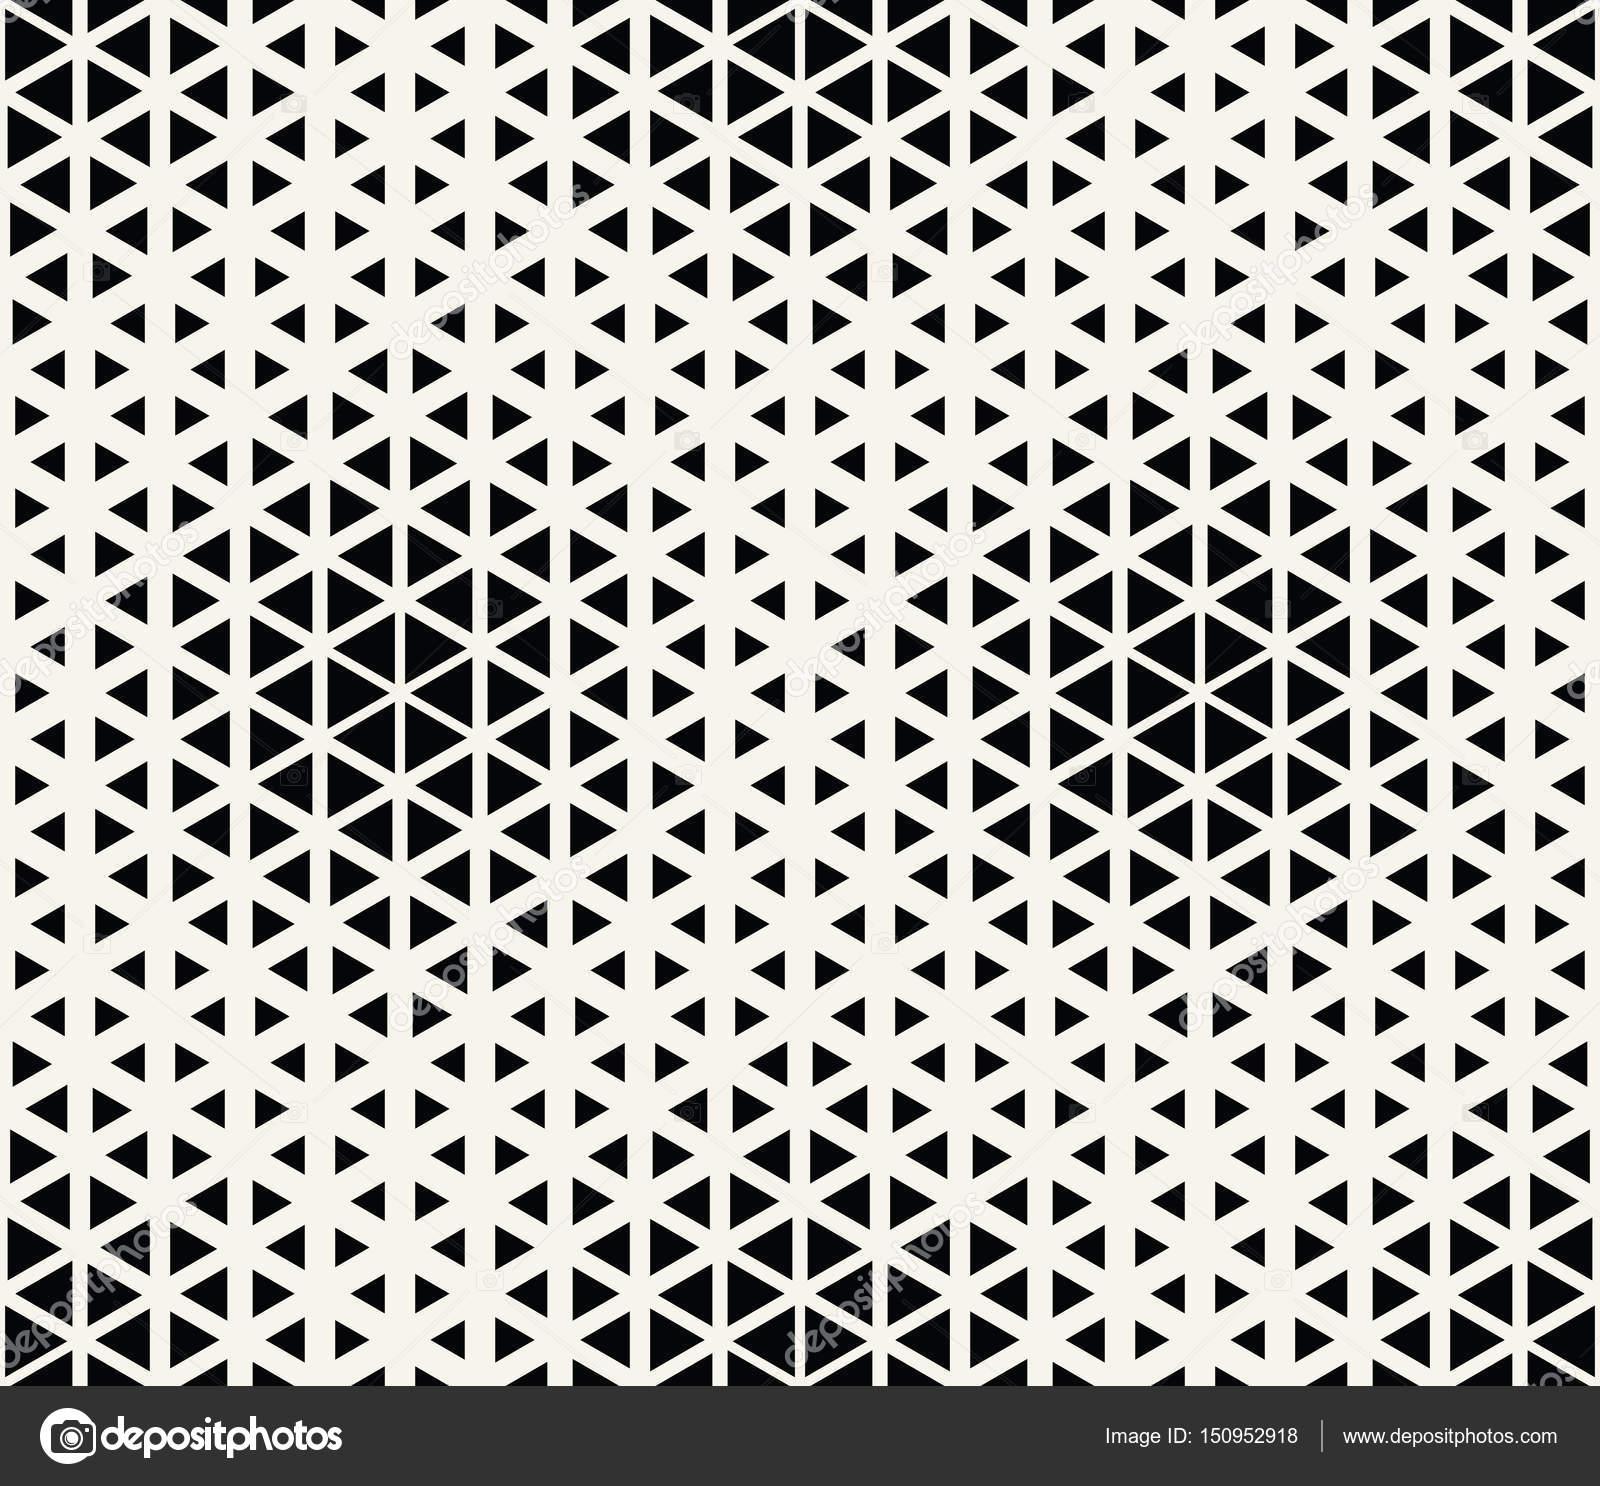 abstrakte geometrische Dreieck nahtloser Vektor Muster Raster ...